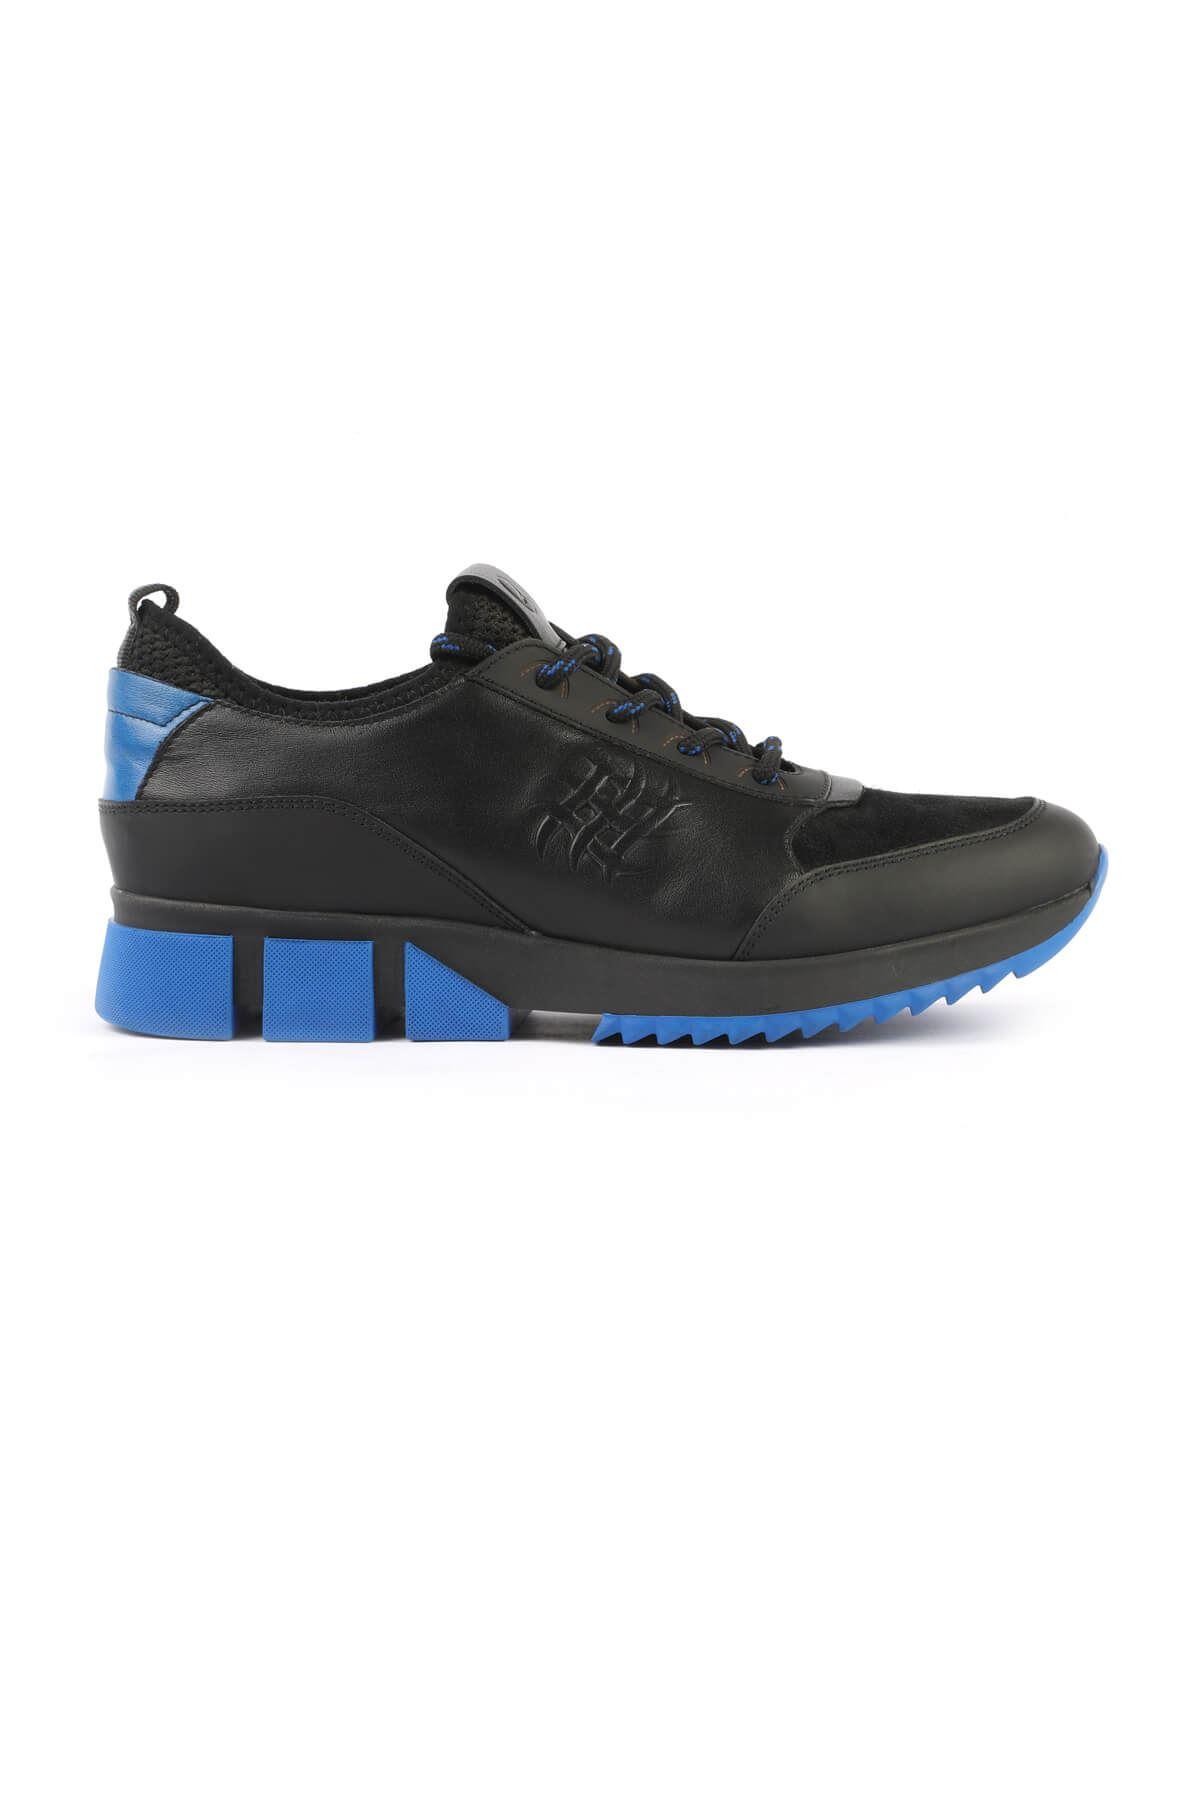 Libero 3130 Black Blue Sport Shoes